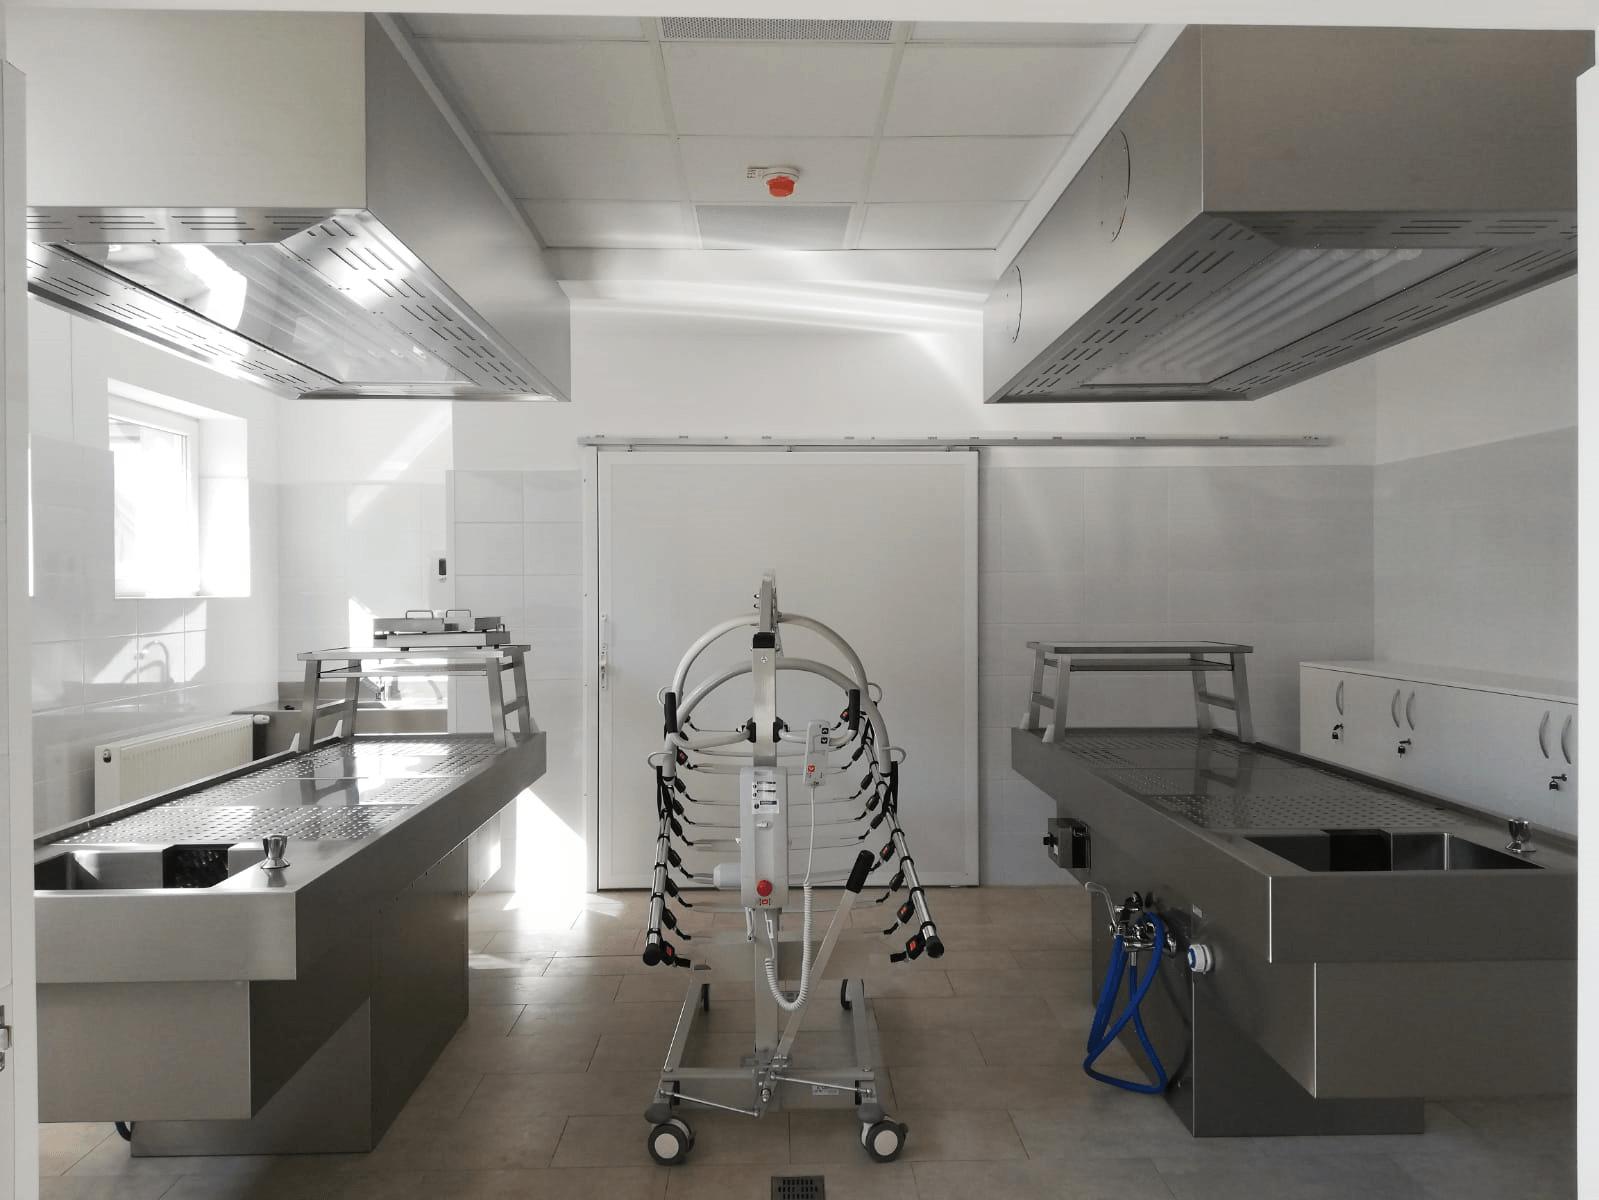 Prosectura Spitalului Judetean Baia Mare, dotata si echipata la cele mai inalte standarde (FOTO)